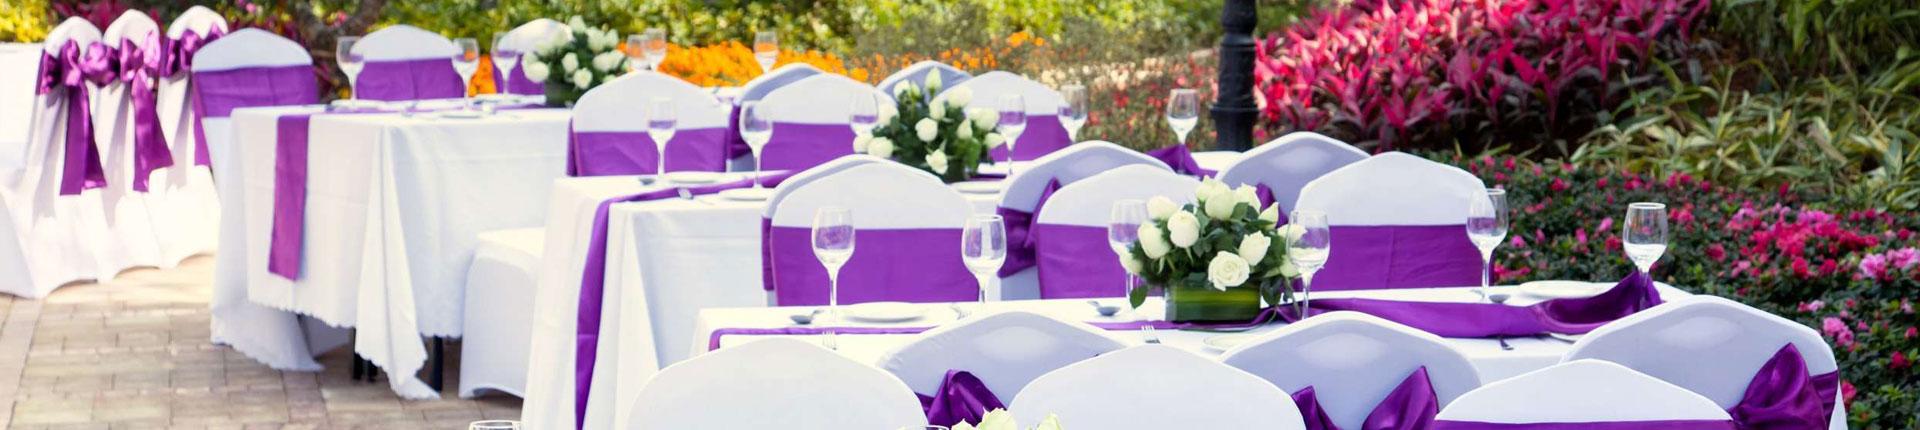 location-de-nappes-mariage-st-hubert